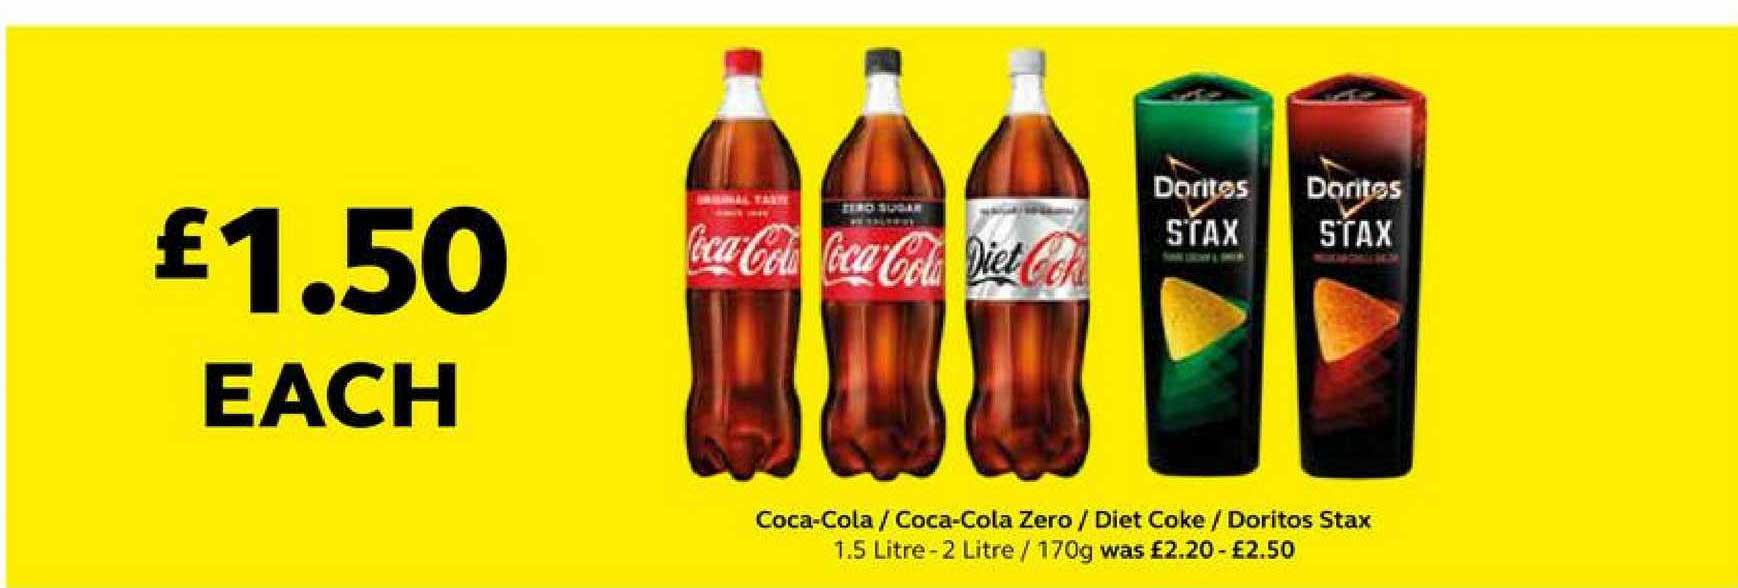 SuperValu Coca-cola Coca-cola Zero Diet Coke Doritos Stax